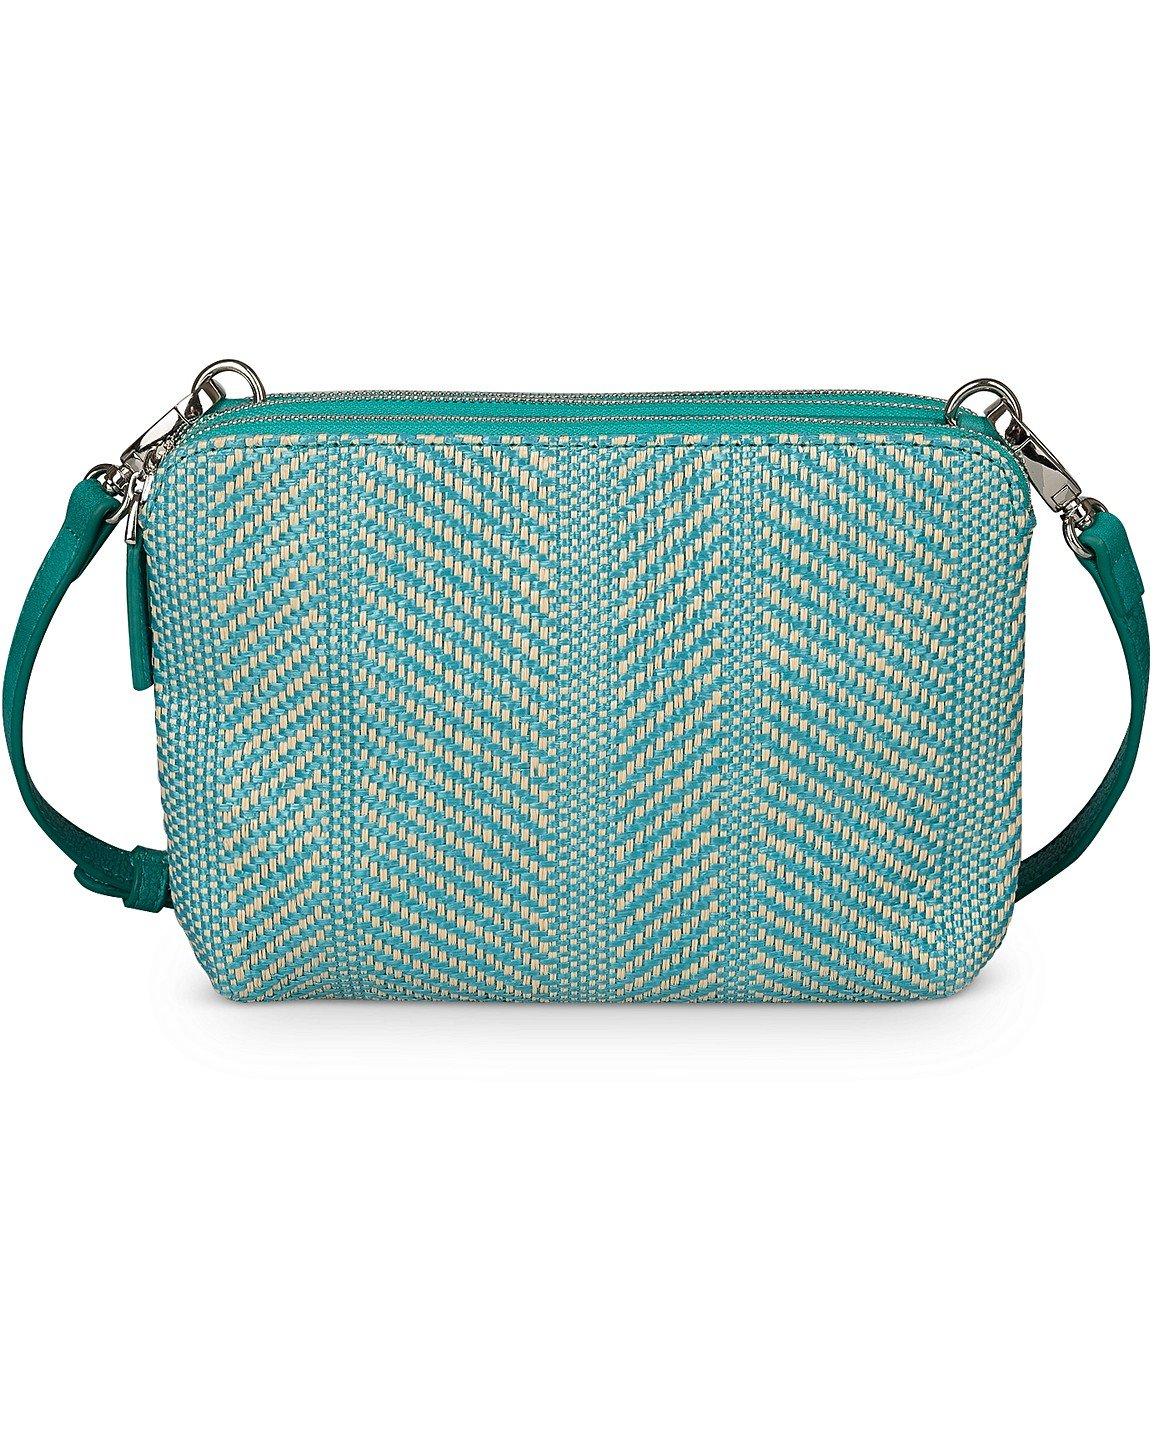 36c03e3676 Carlee Weave Teal Blue Cross Body Bag